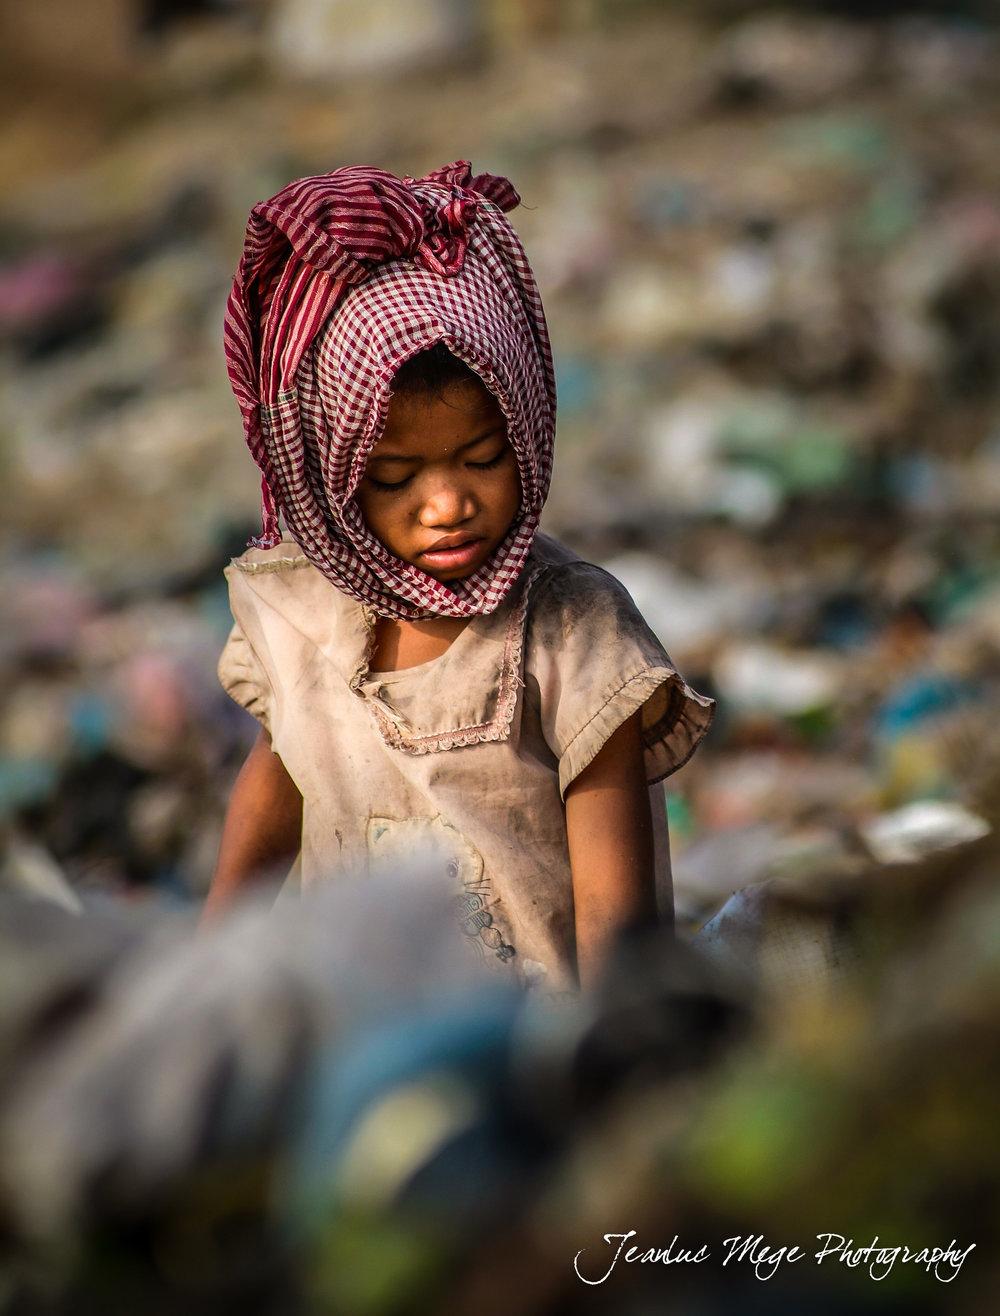 Jean Luc Mege Cambodia-8597.jpg